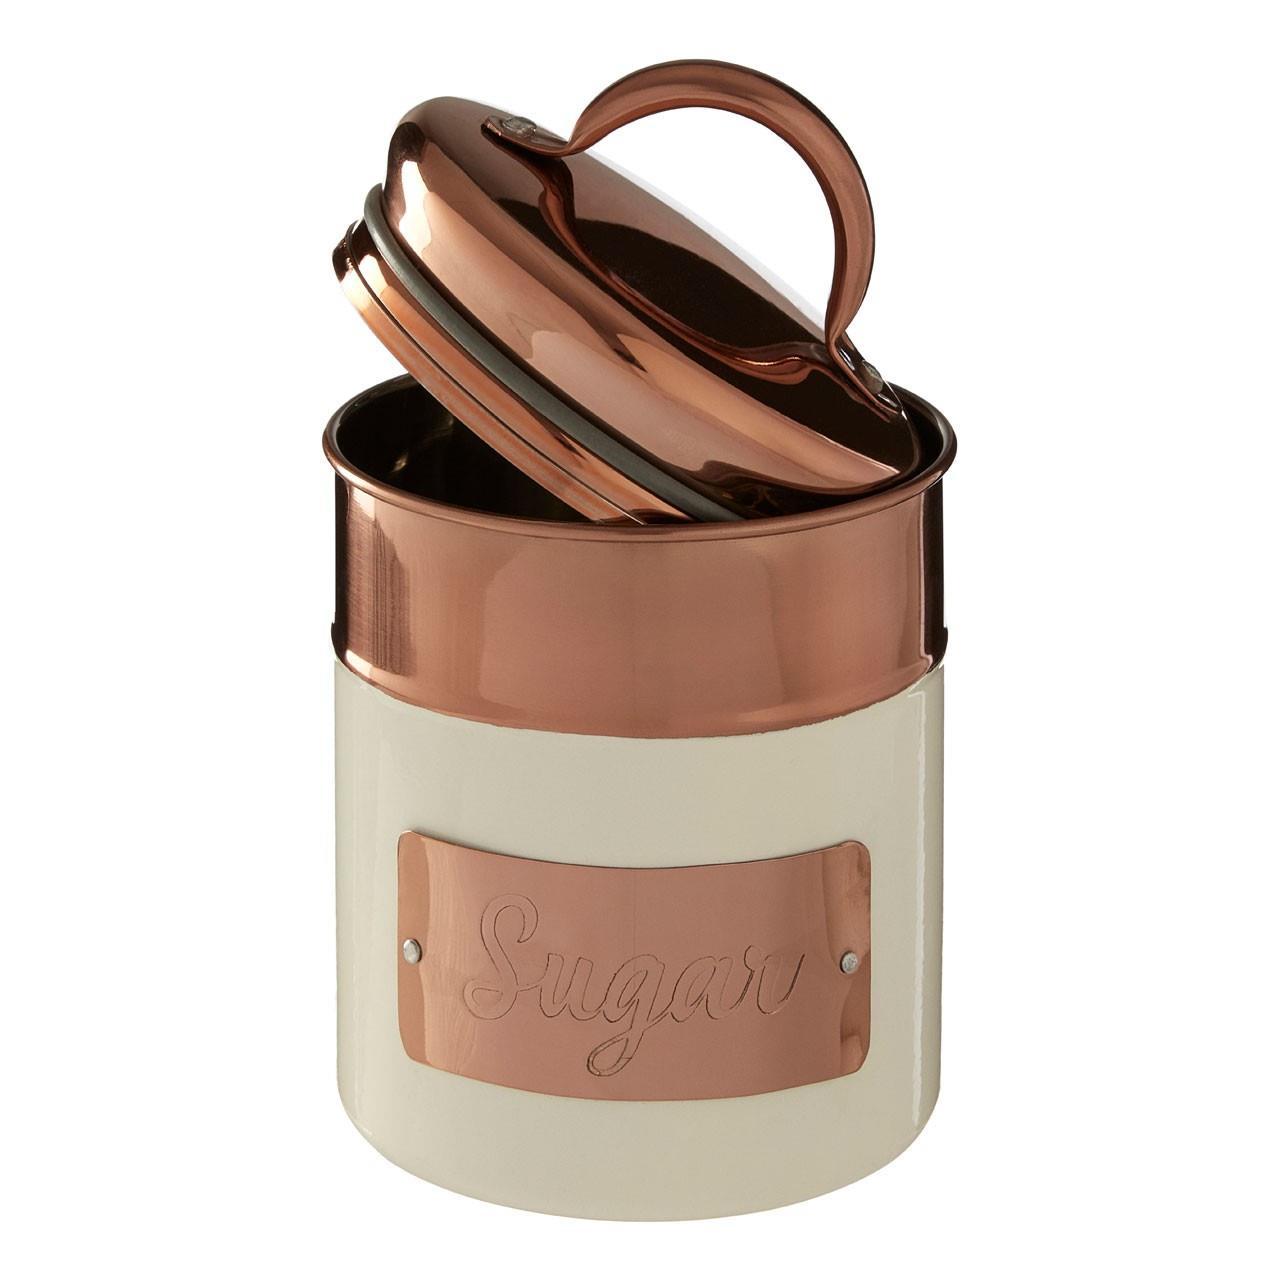 Prescott-Cream-Copper-Bread-Bin-Biscuit-Sugar-Coffee-Canister-Utensil-Holder thumbnail 13